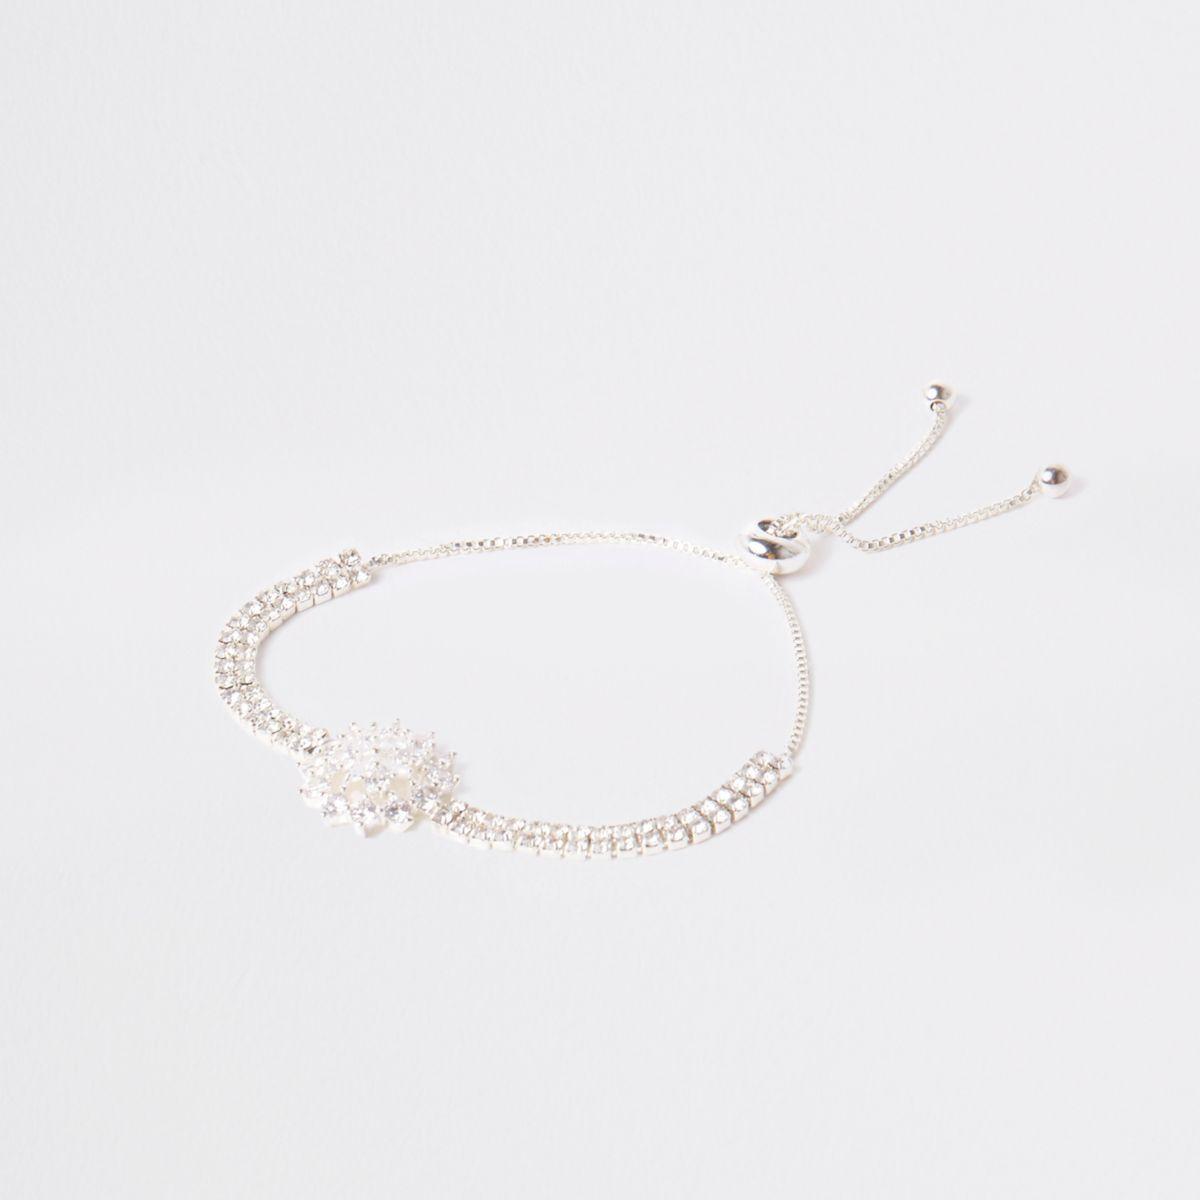 Silver tone floral rhinestone lariat bracelet